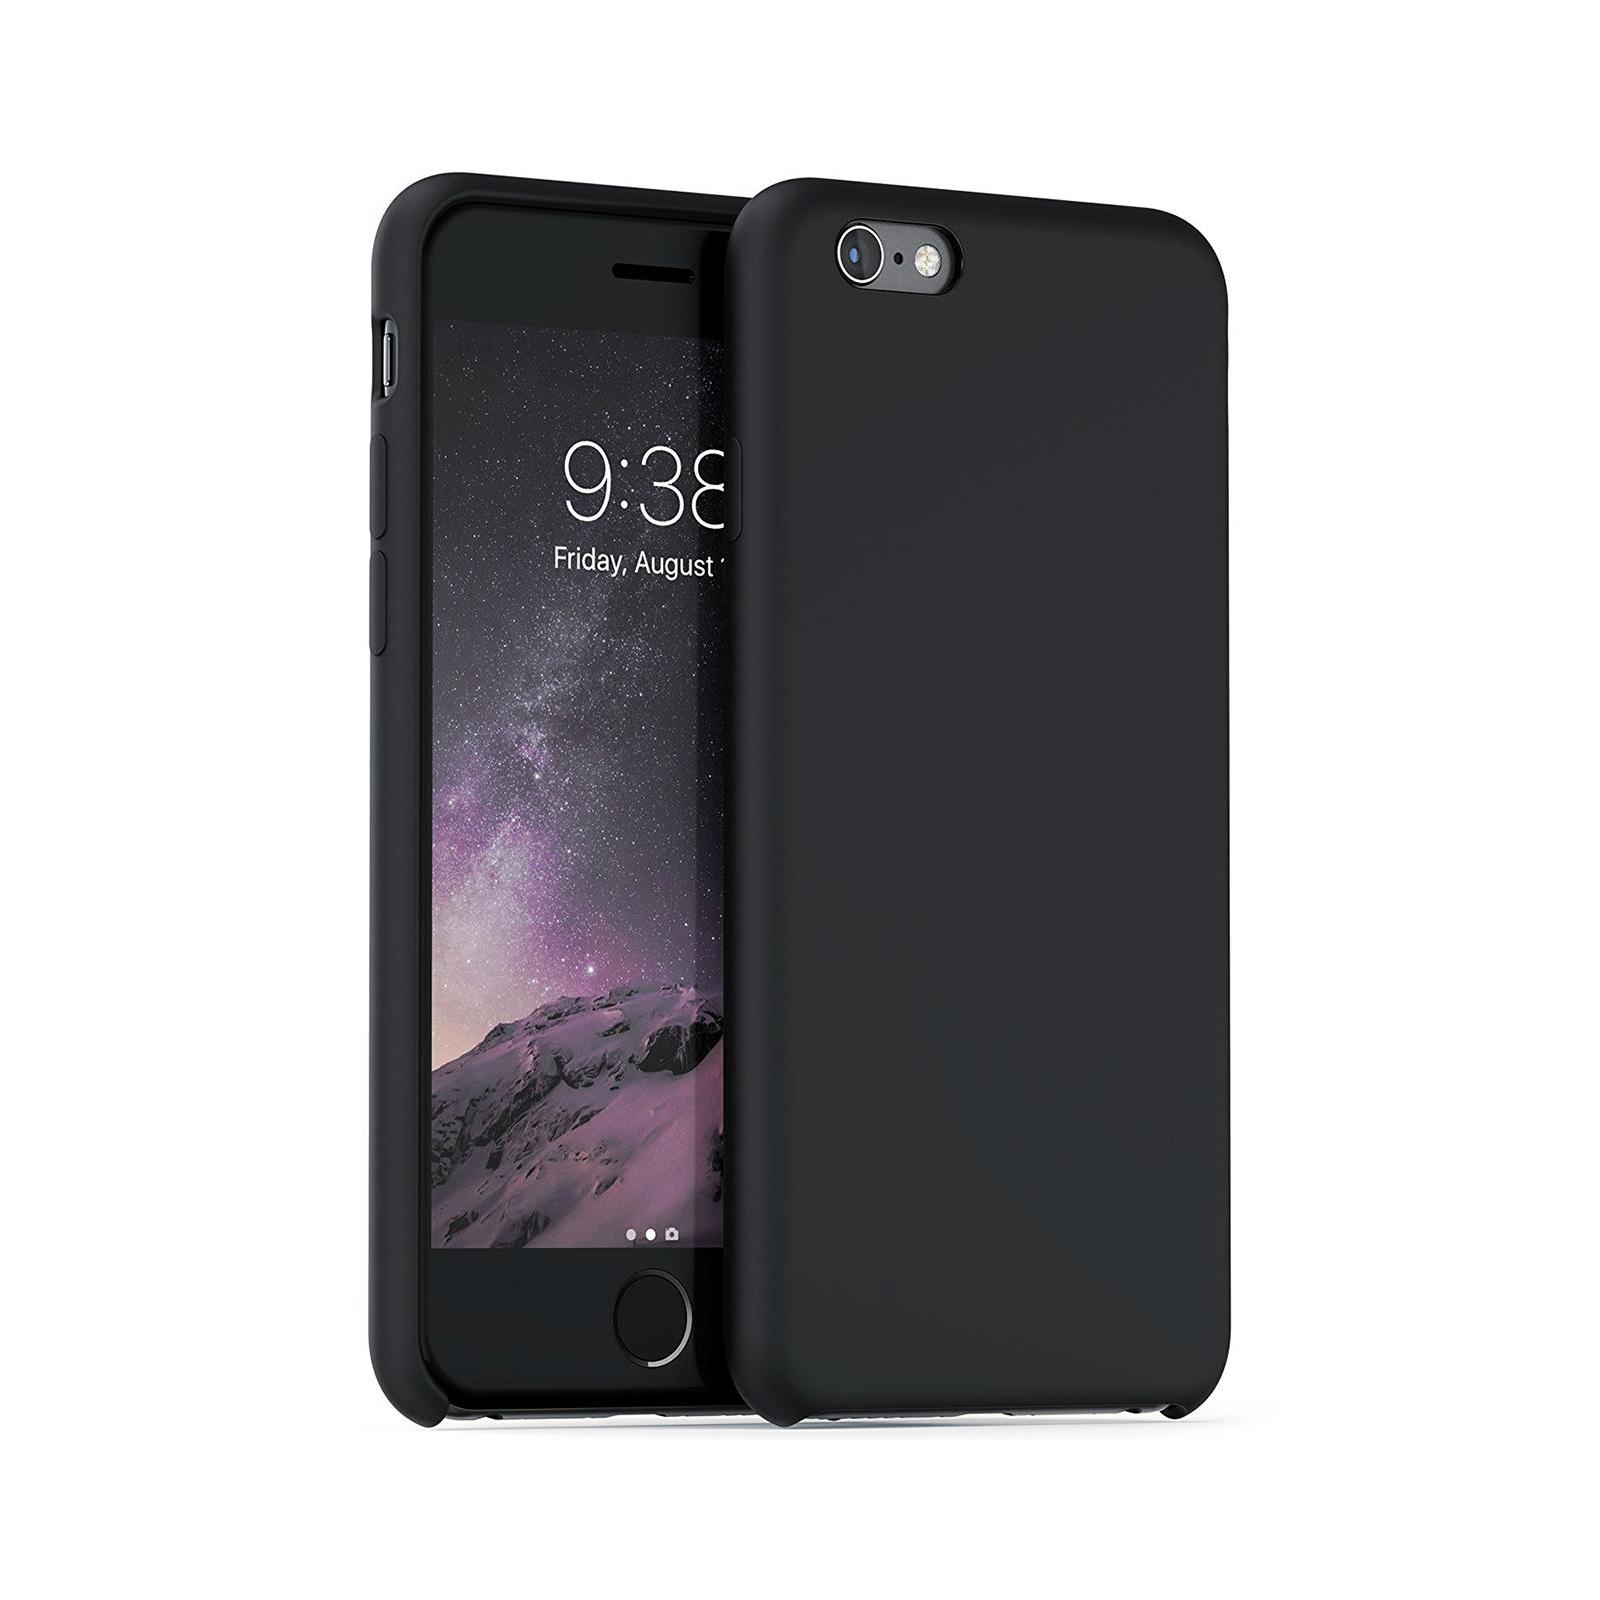 Чехол для моб. телефона Laudtec для iPhone 6/6s liquid case (black) (LT-I6LC)